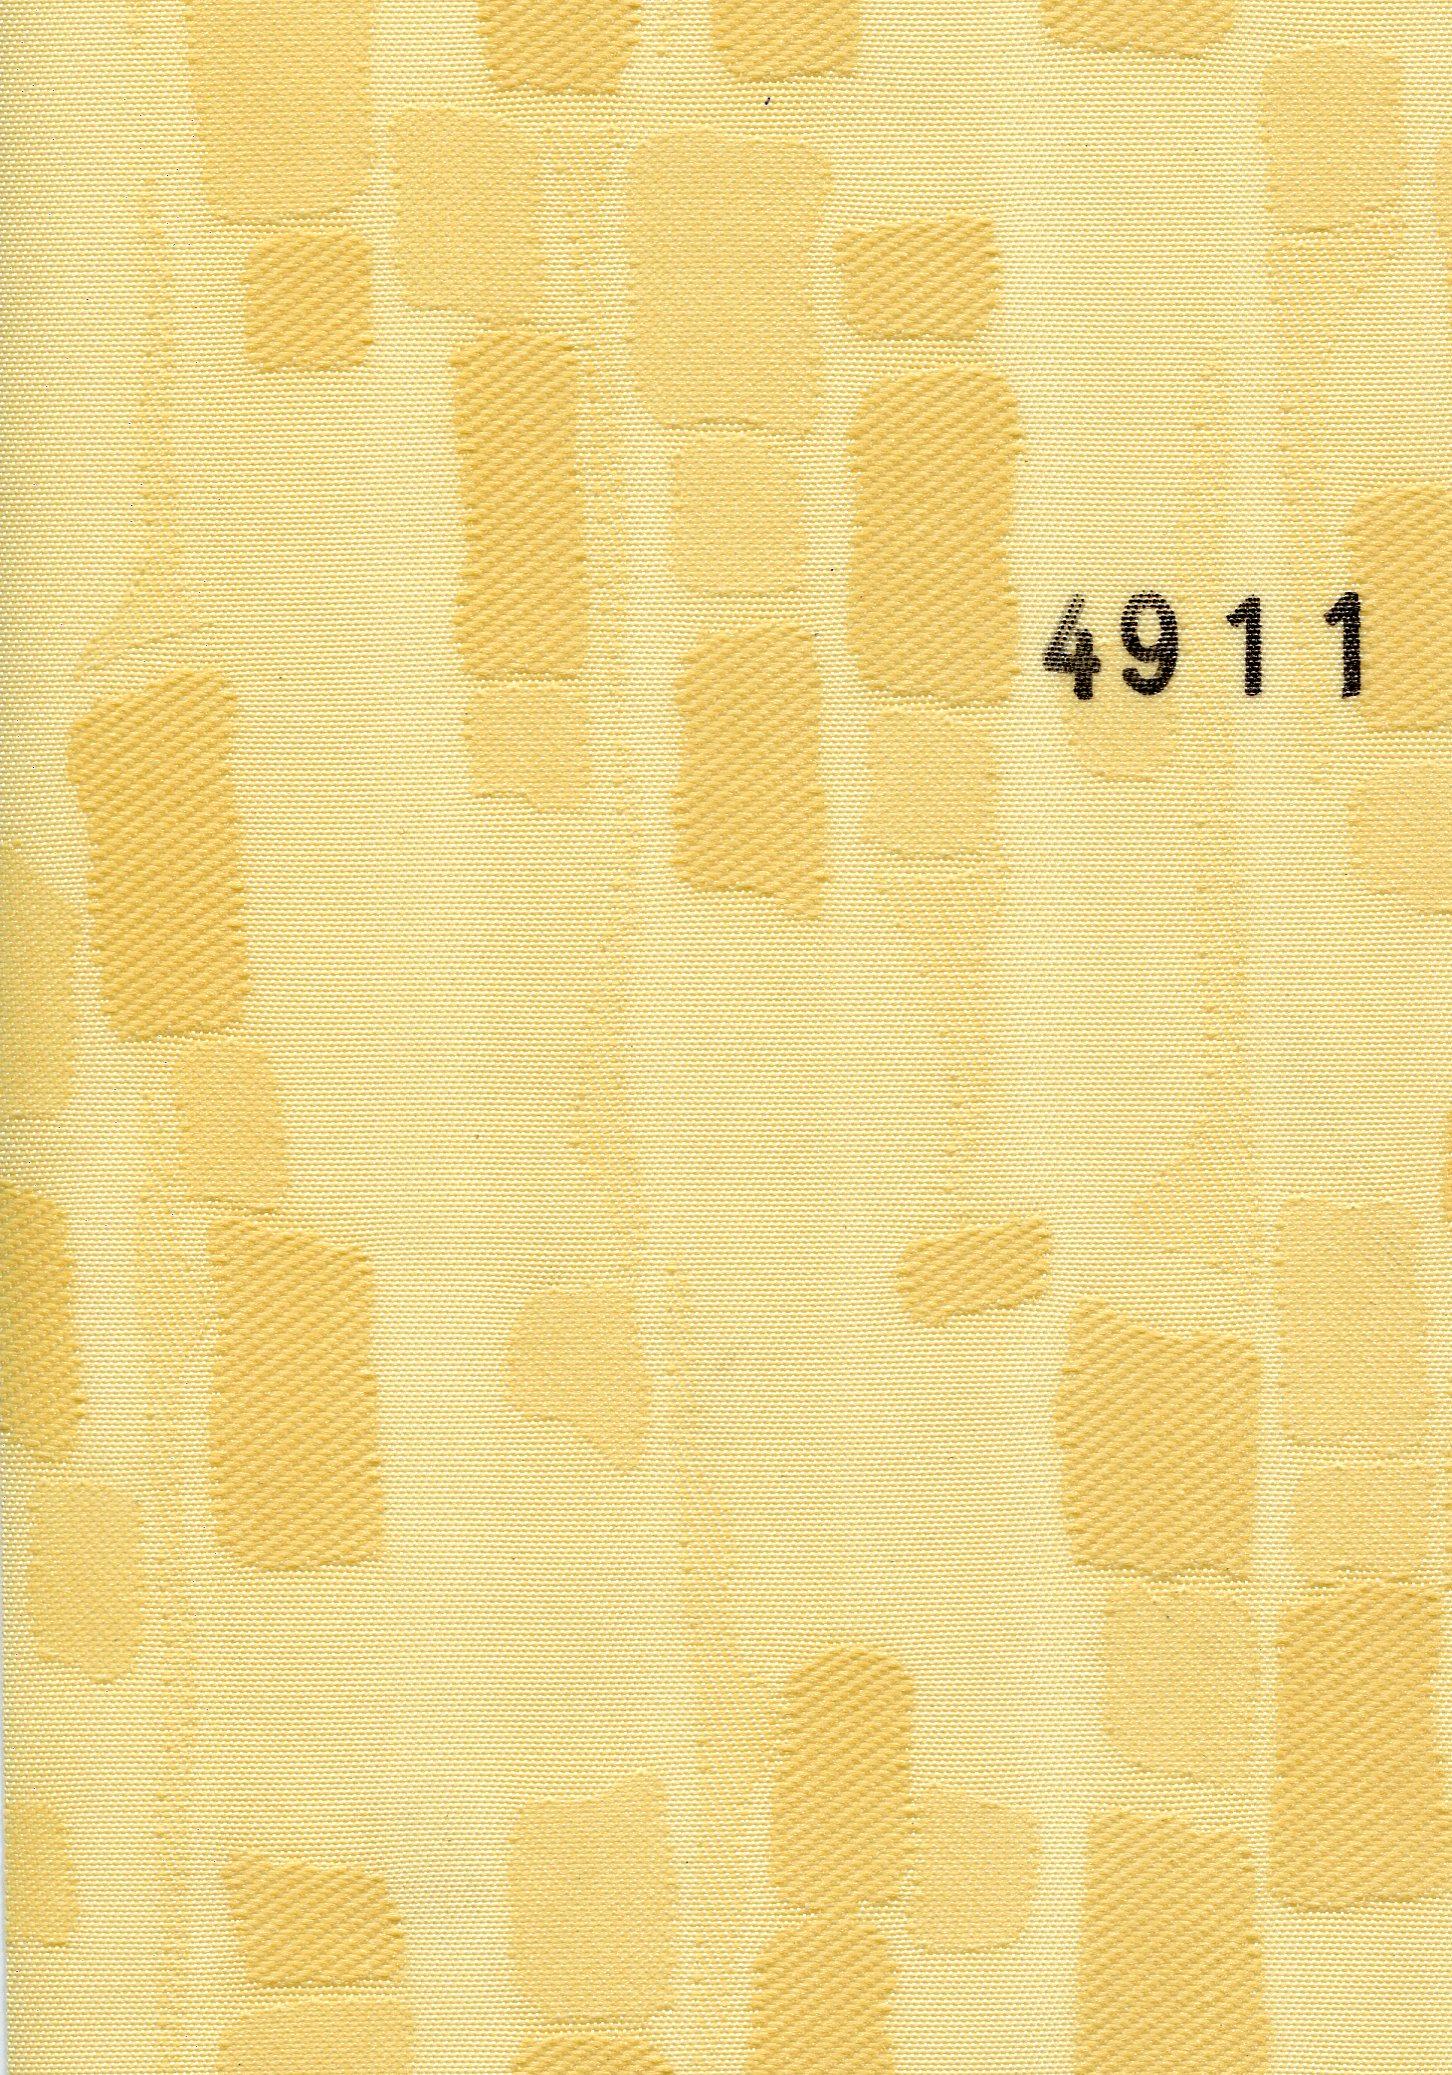 Rembrant 4911